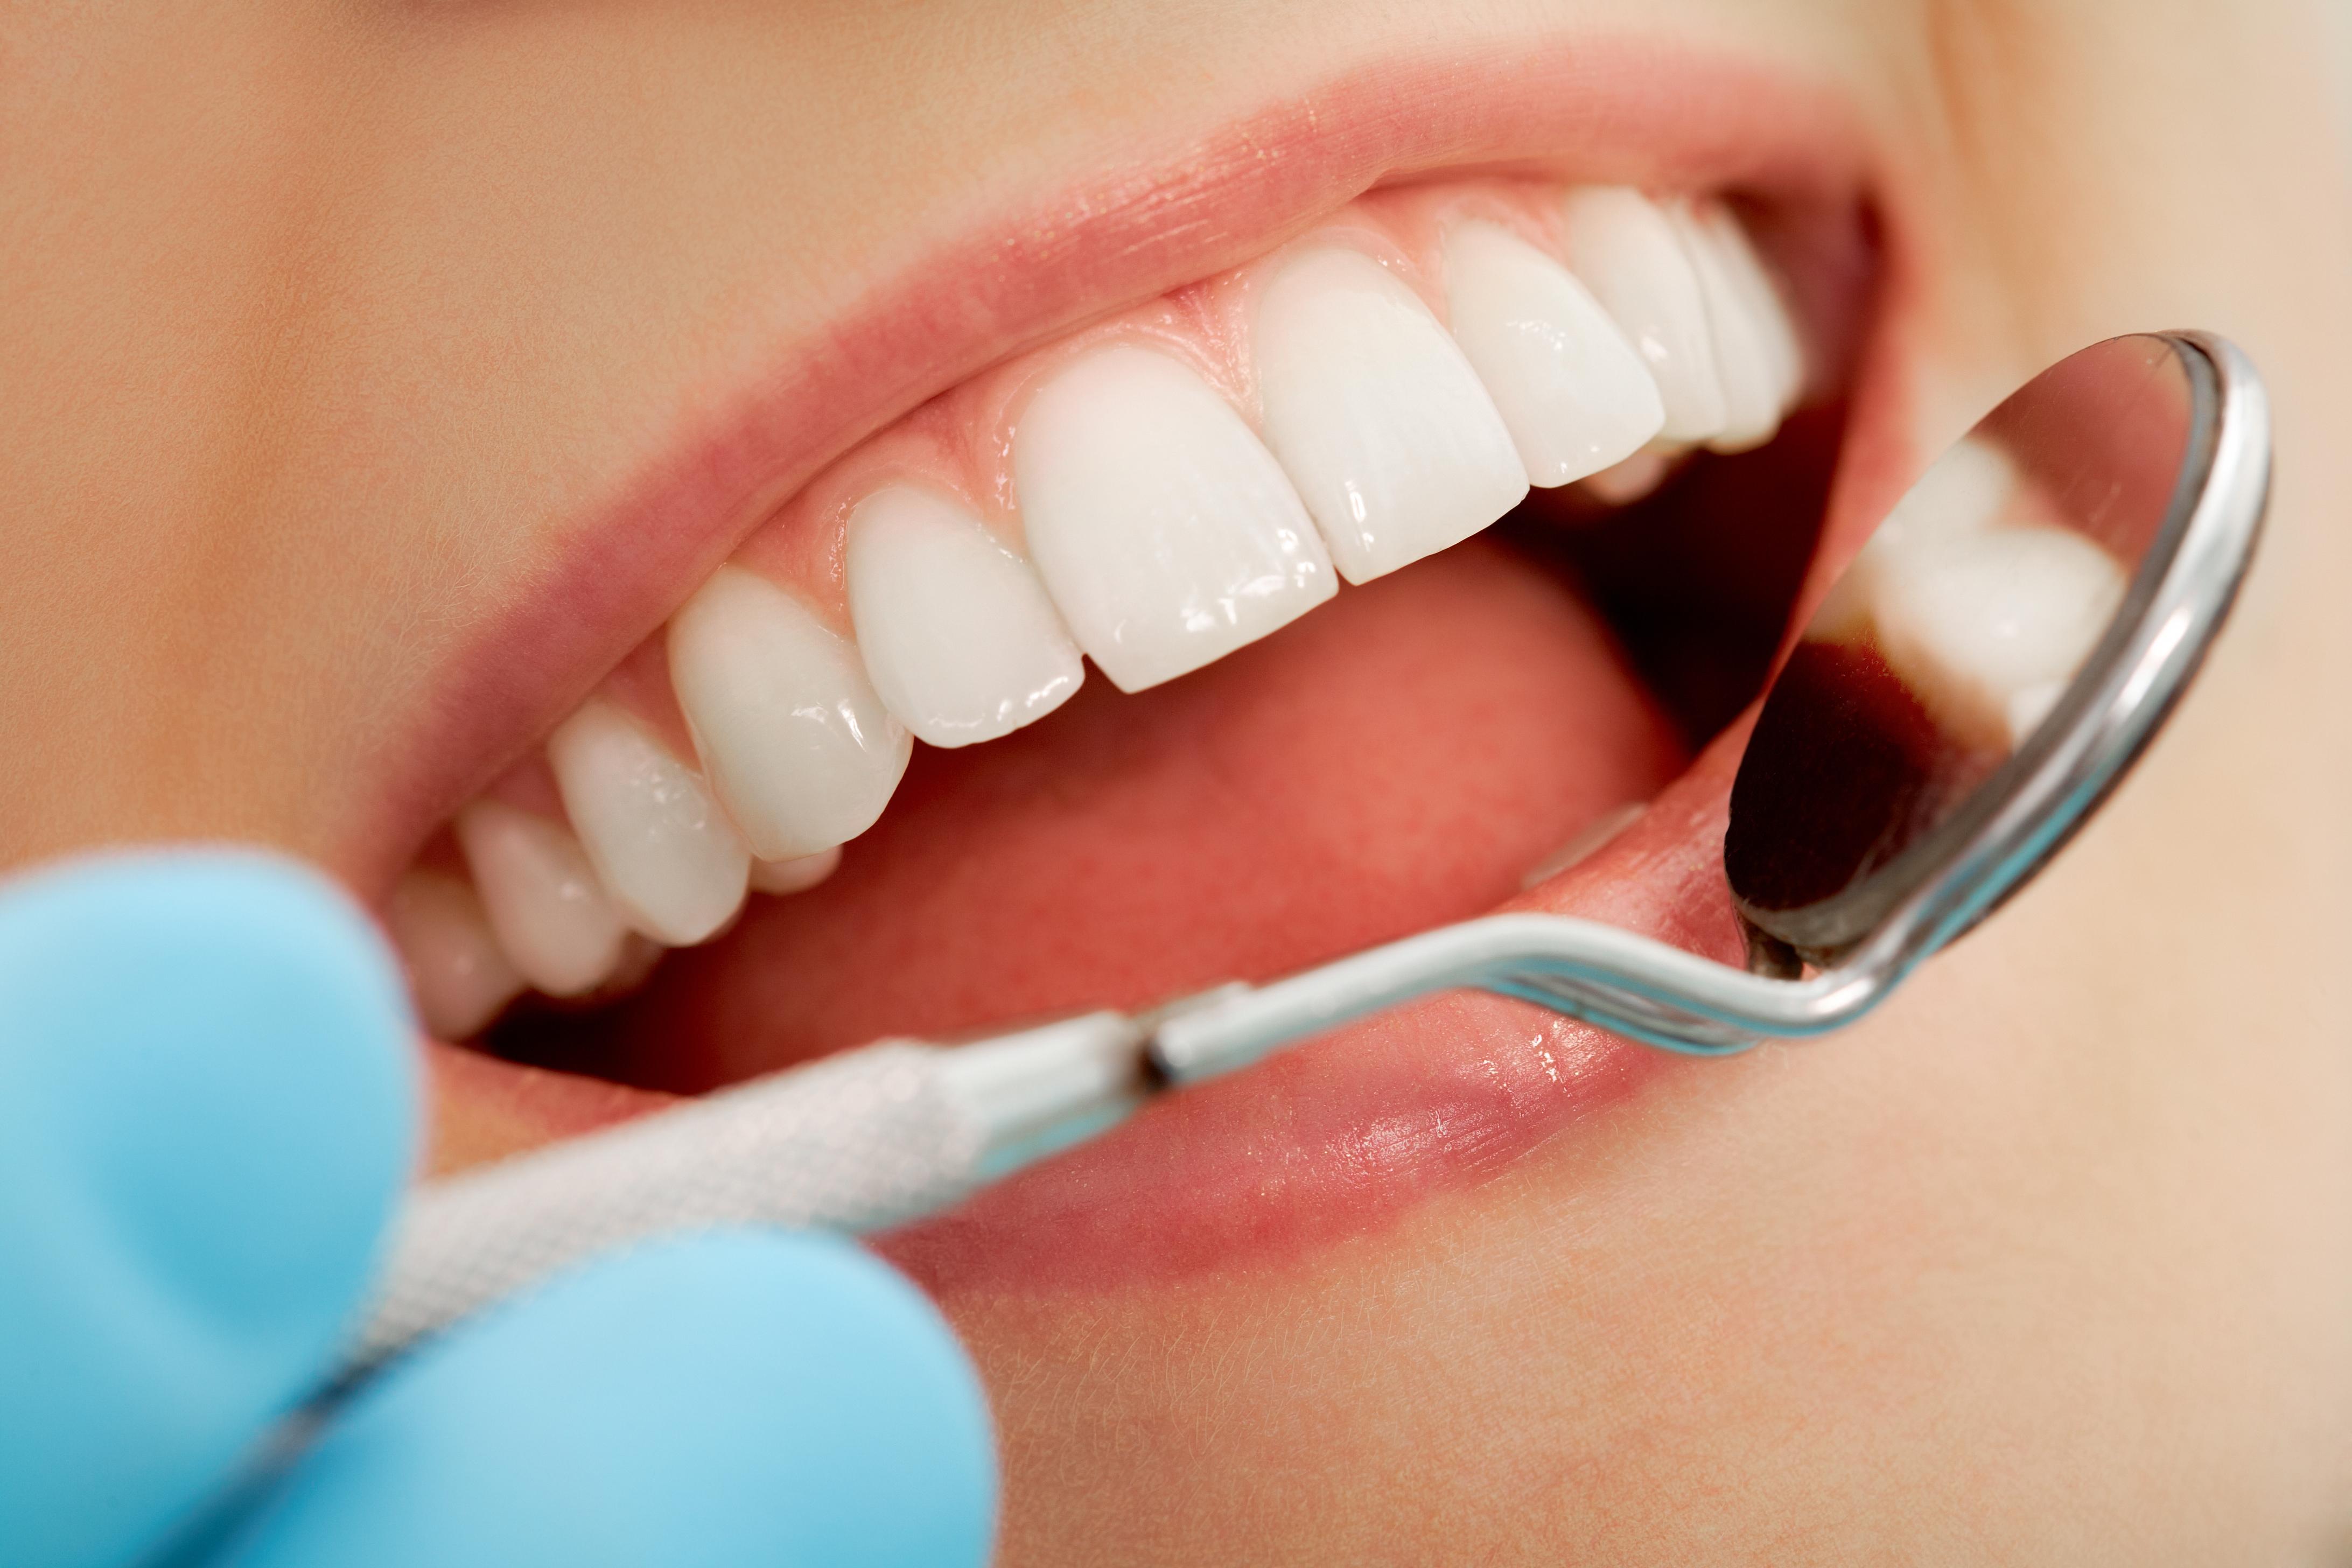 болезнь зубов психосоматика фото